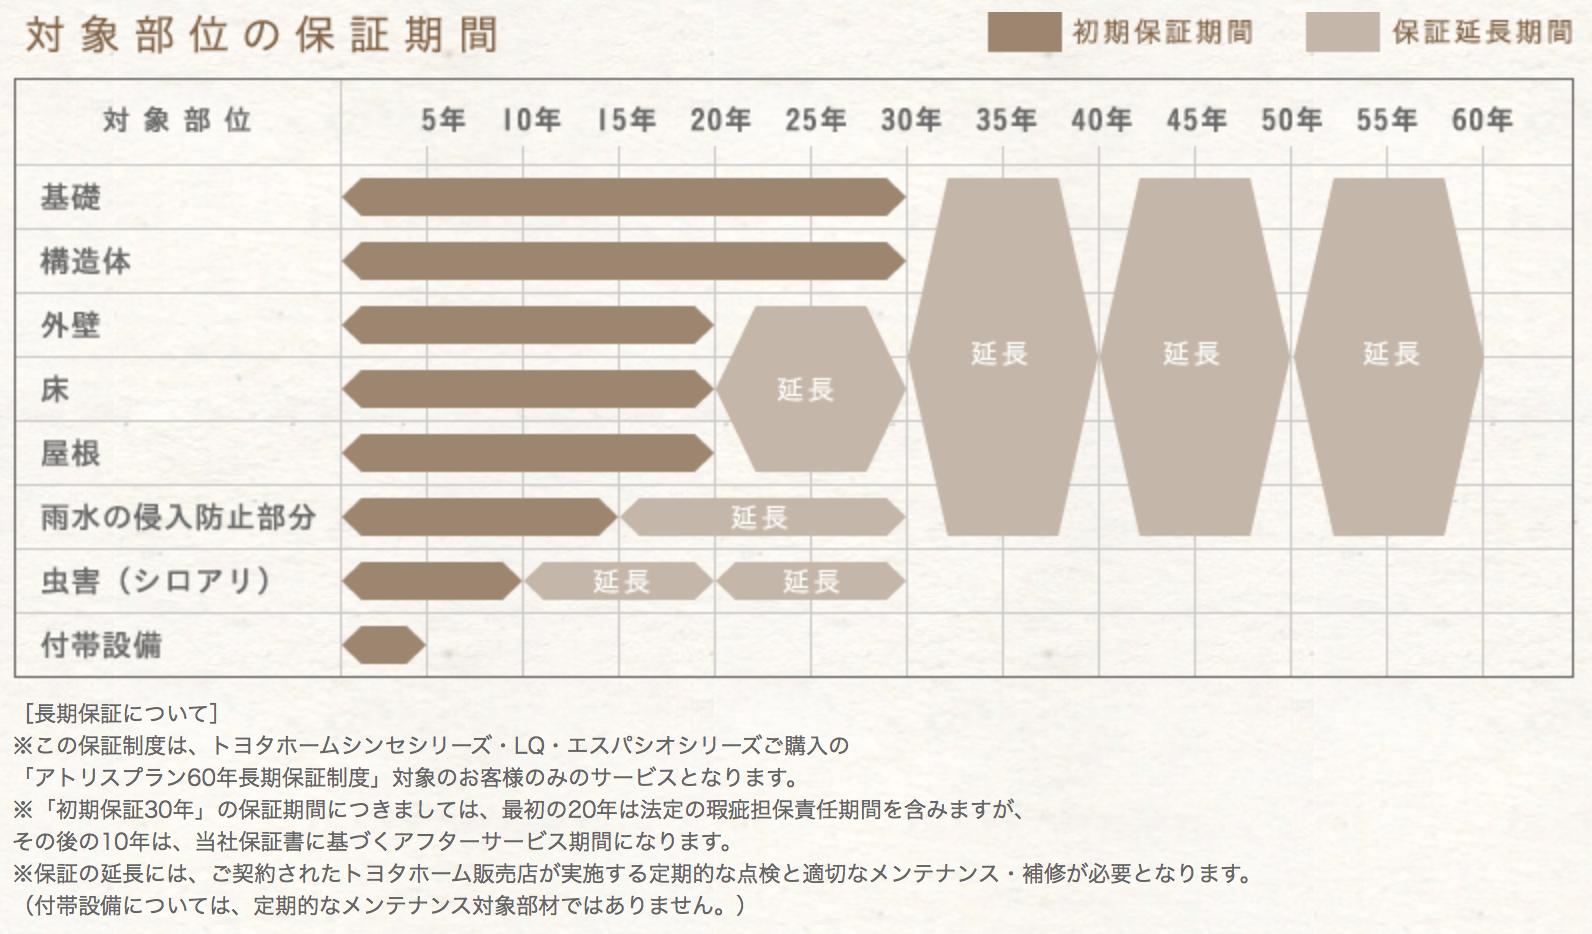 %e3%82%b9%e3%82%af%e3%83%aa%e3%83%bc%e3%83%b3%e3%82%b7%e3%83%a7%e3%83%83%e3%83%88-2017-01-09-13-25-27